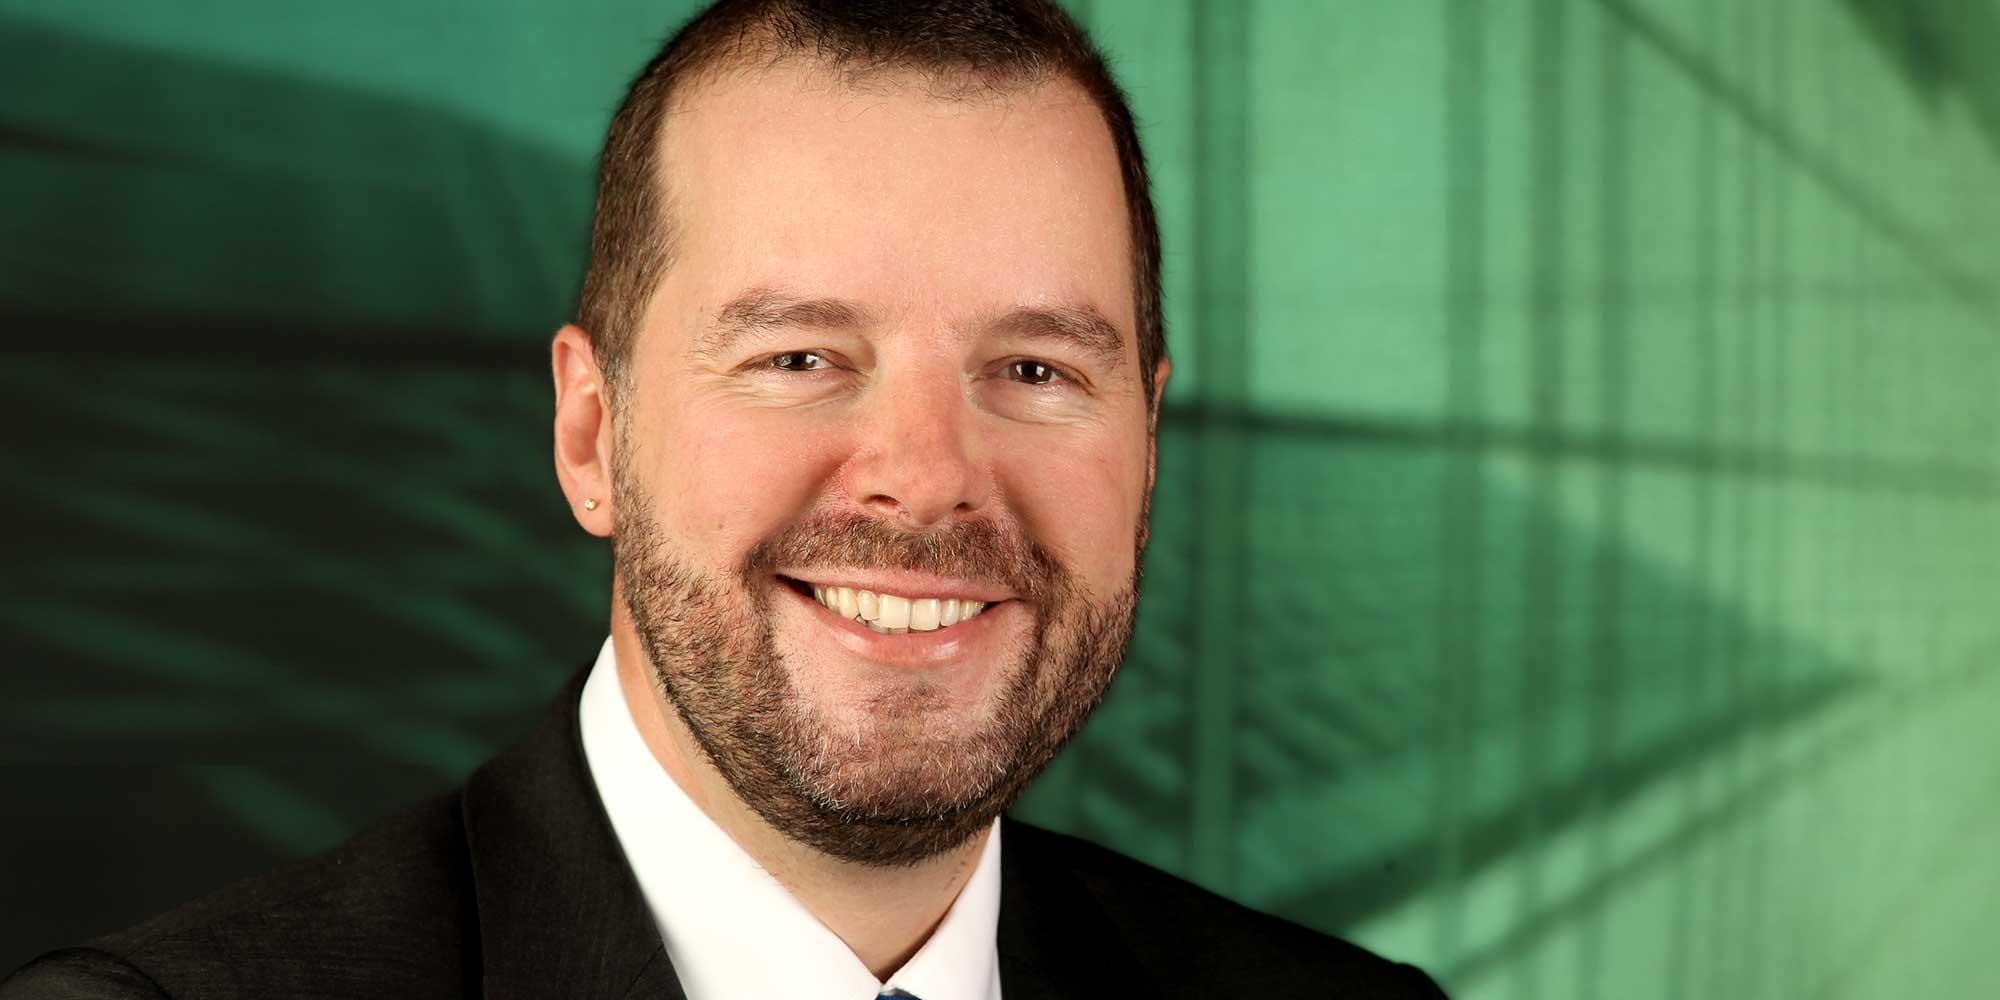 Christian Ekhart